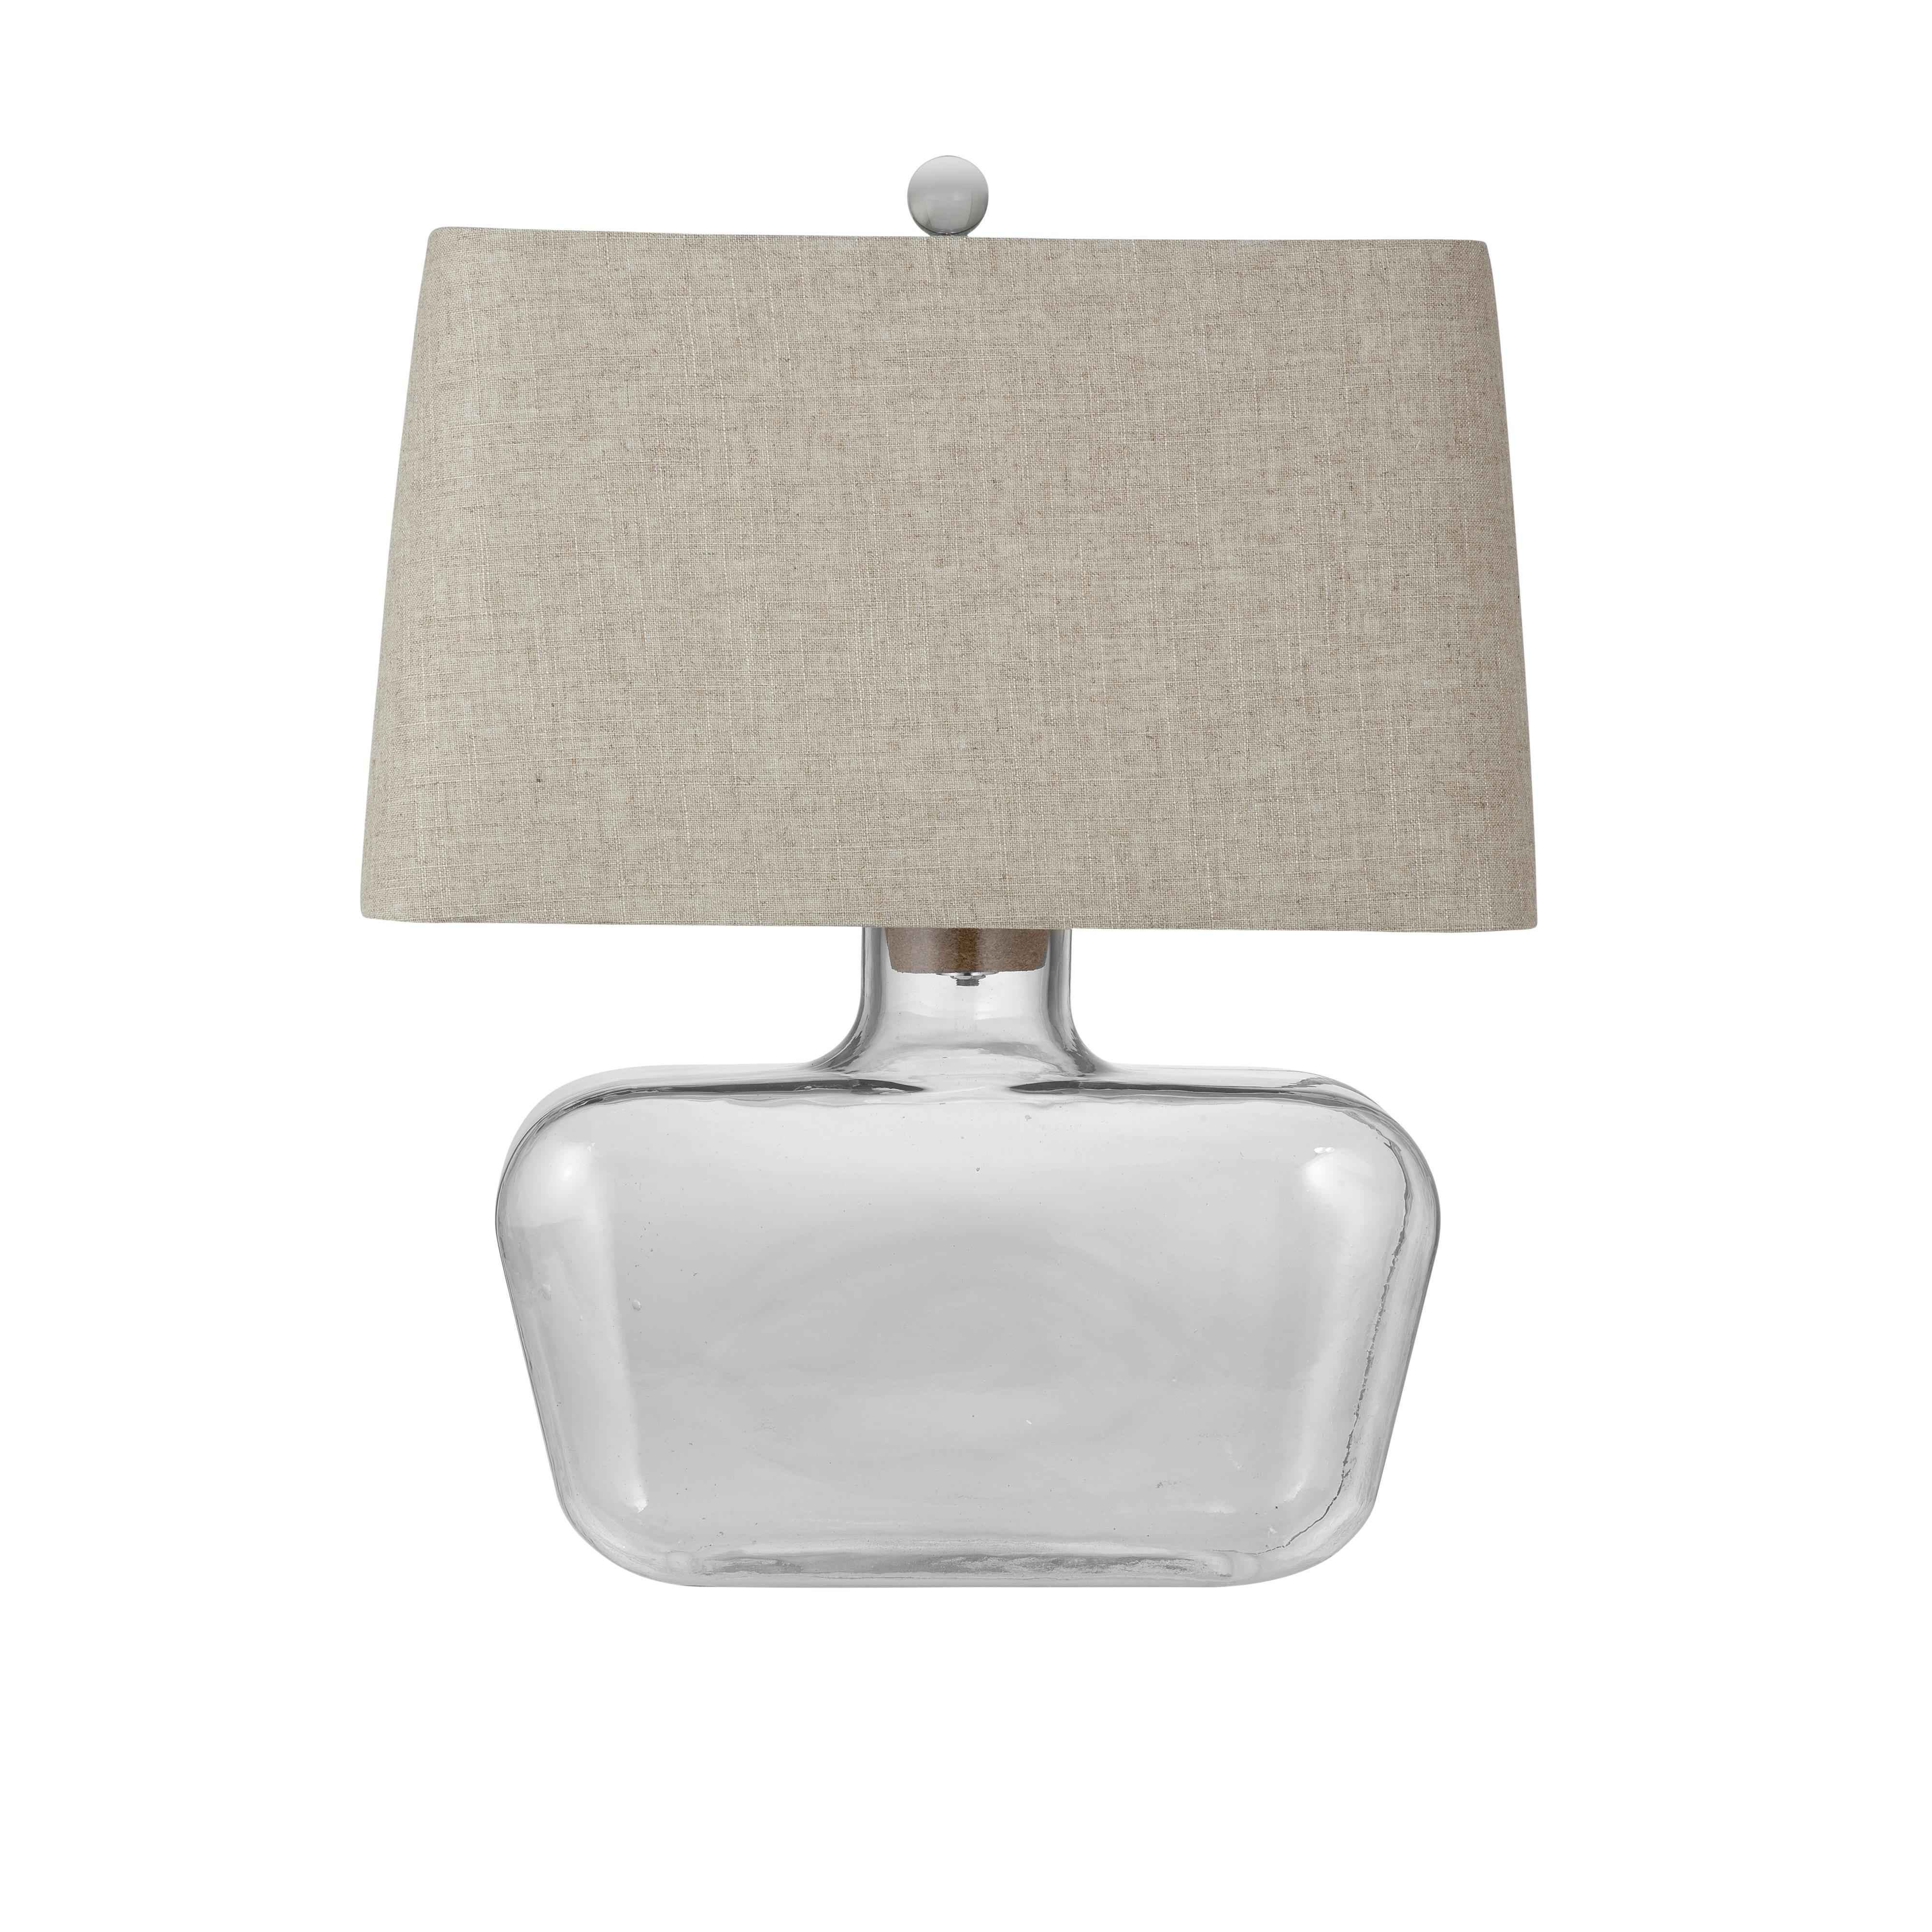 Simon Table Lamp